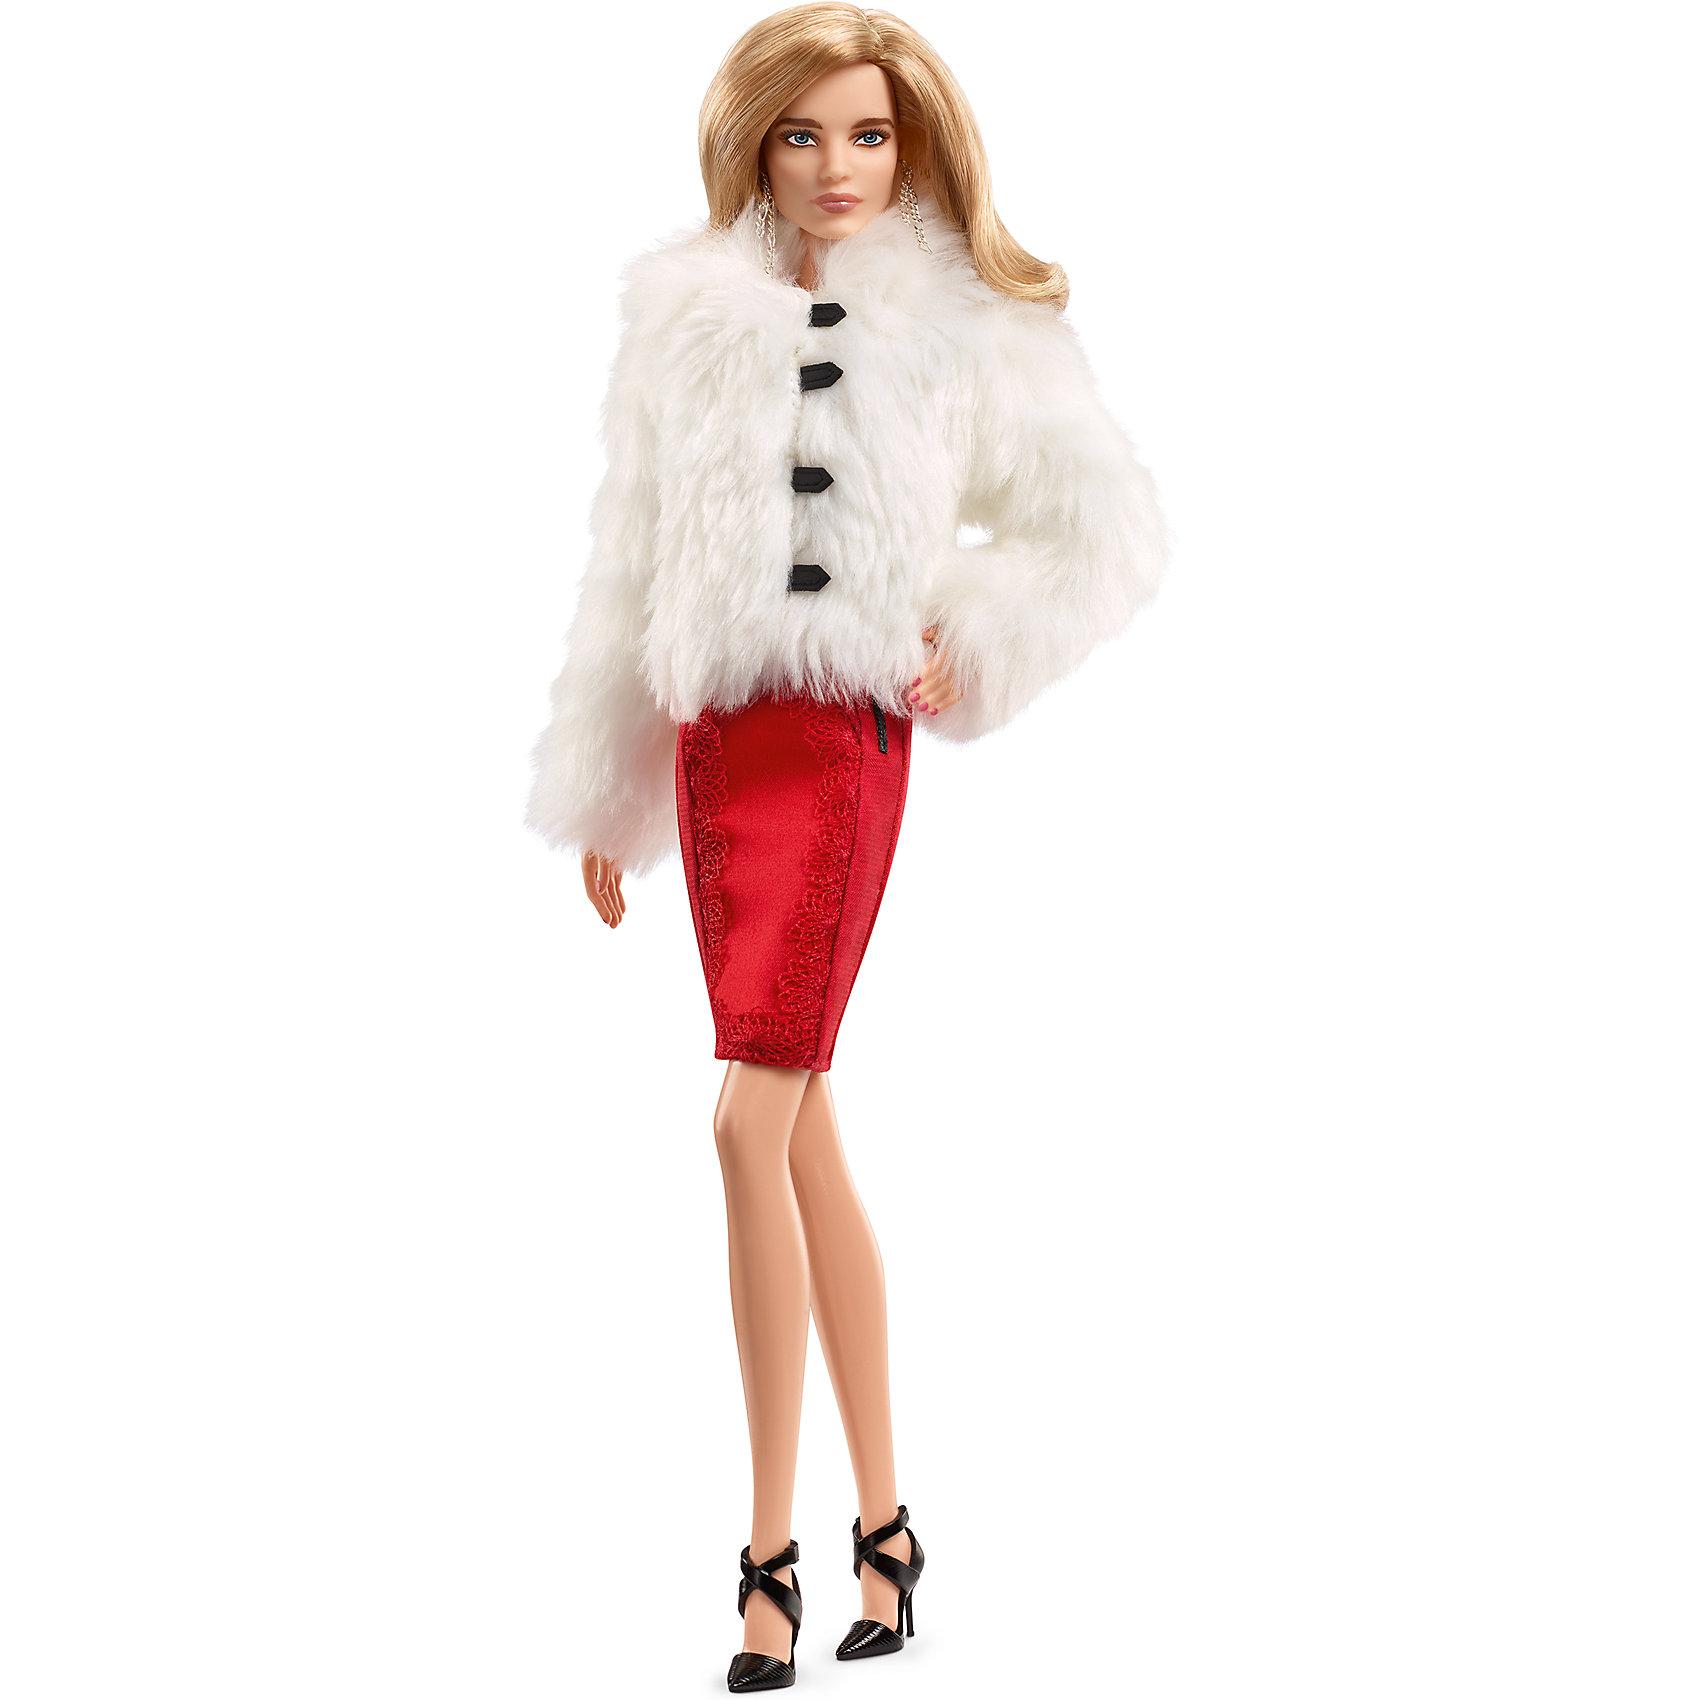 Коллекционная кукла Наталья Водянова, BarbieПопулярные игрушки<br><br><br>Ширина мм: 205<br>Глубина мм: 85<br>Высота мм: 330<br>Вес г: 547<br>Возраст от месяцев: 72<br>Возраст до месяцев: 144<br>Пол: Женский<br>Возраст: Детский<br>SKU: 5378141